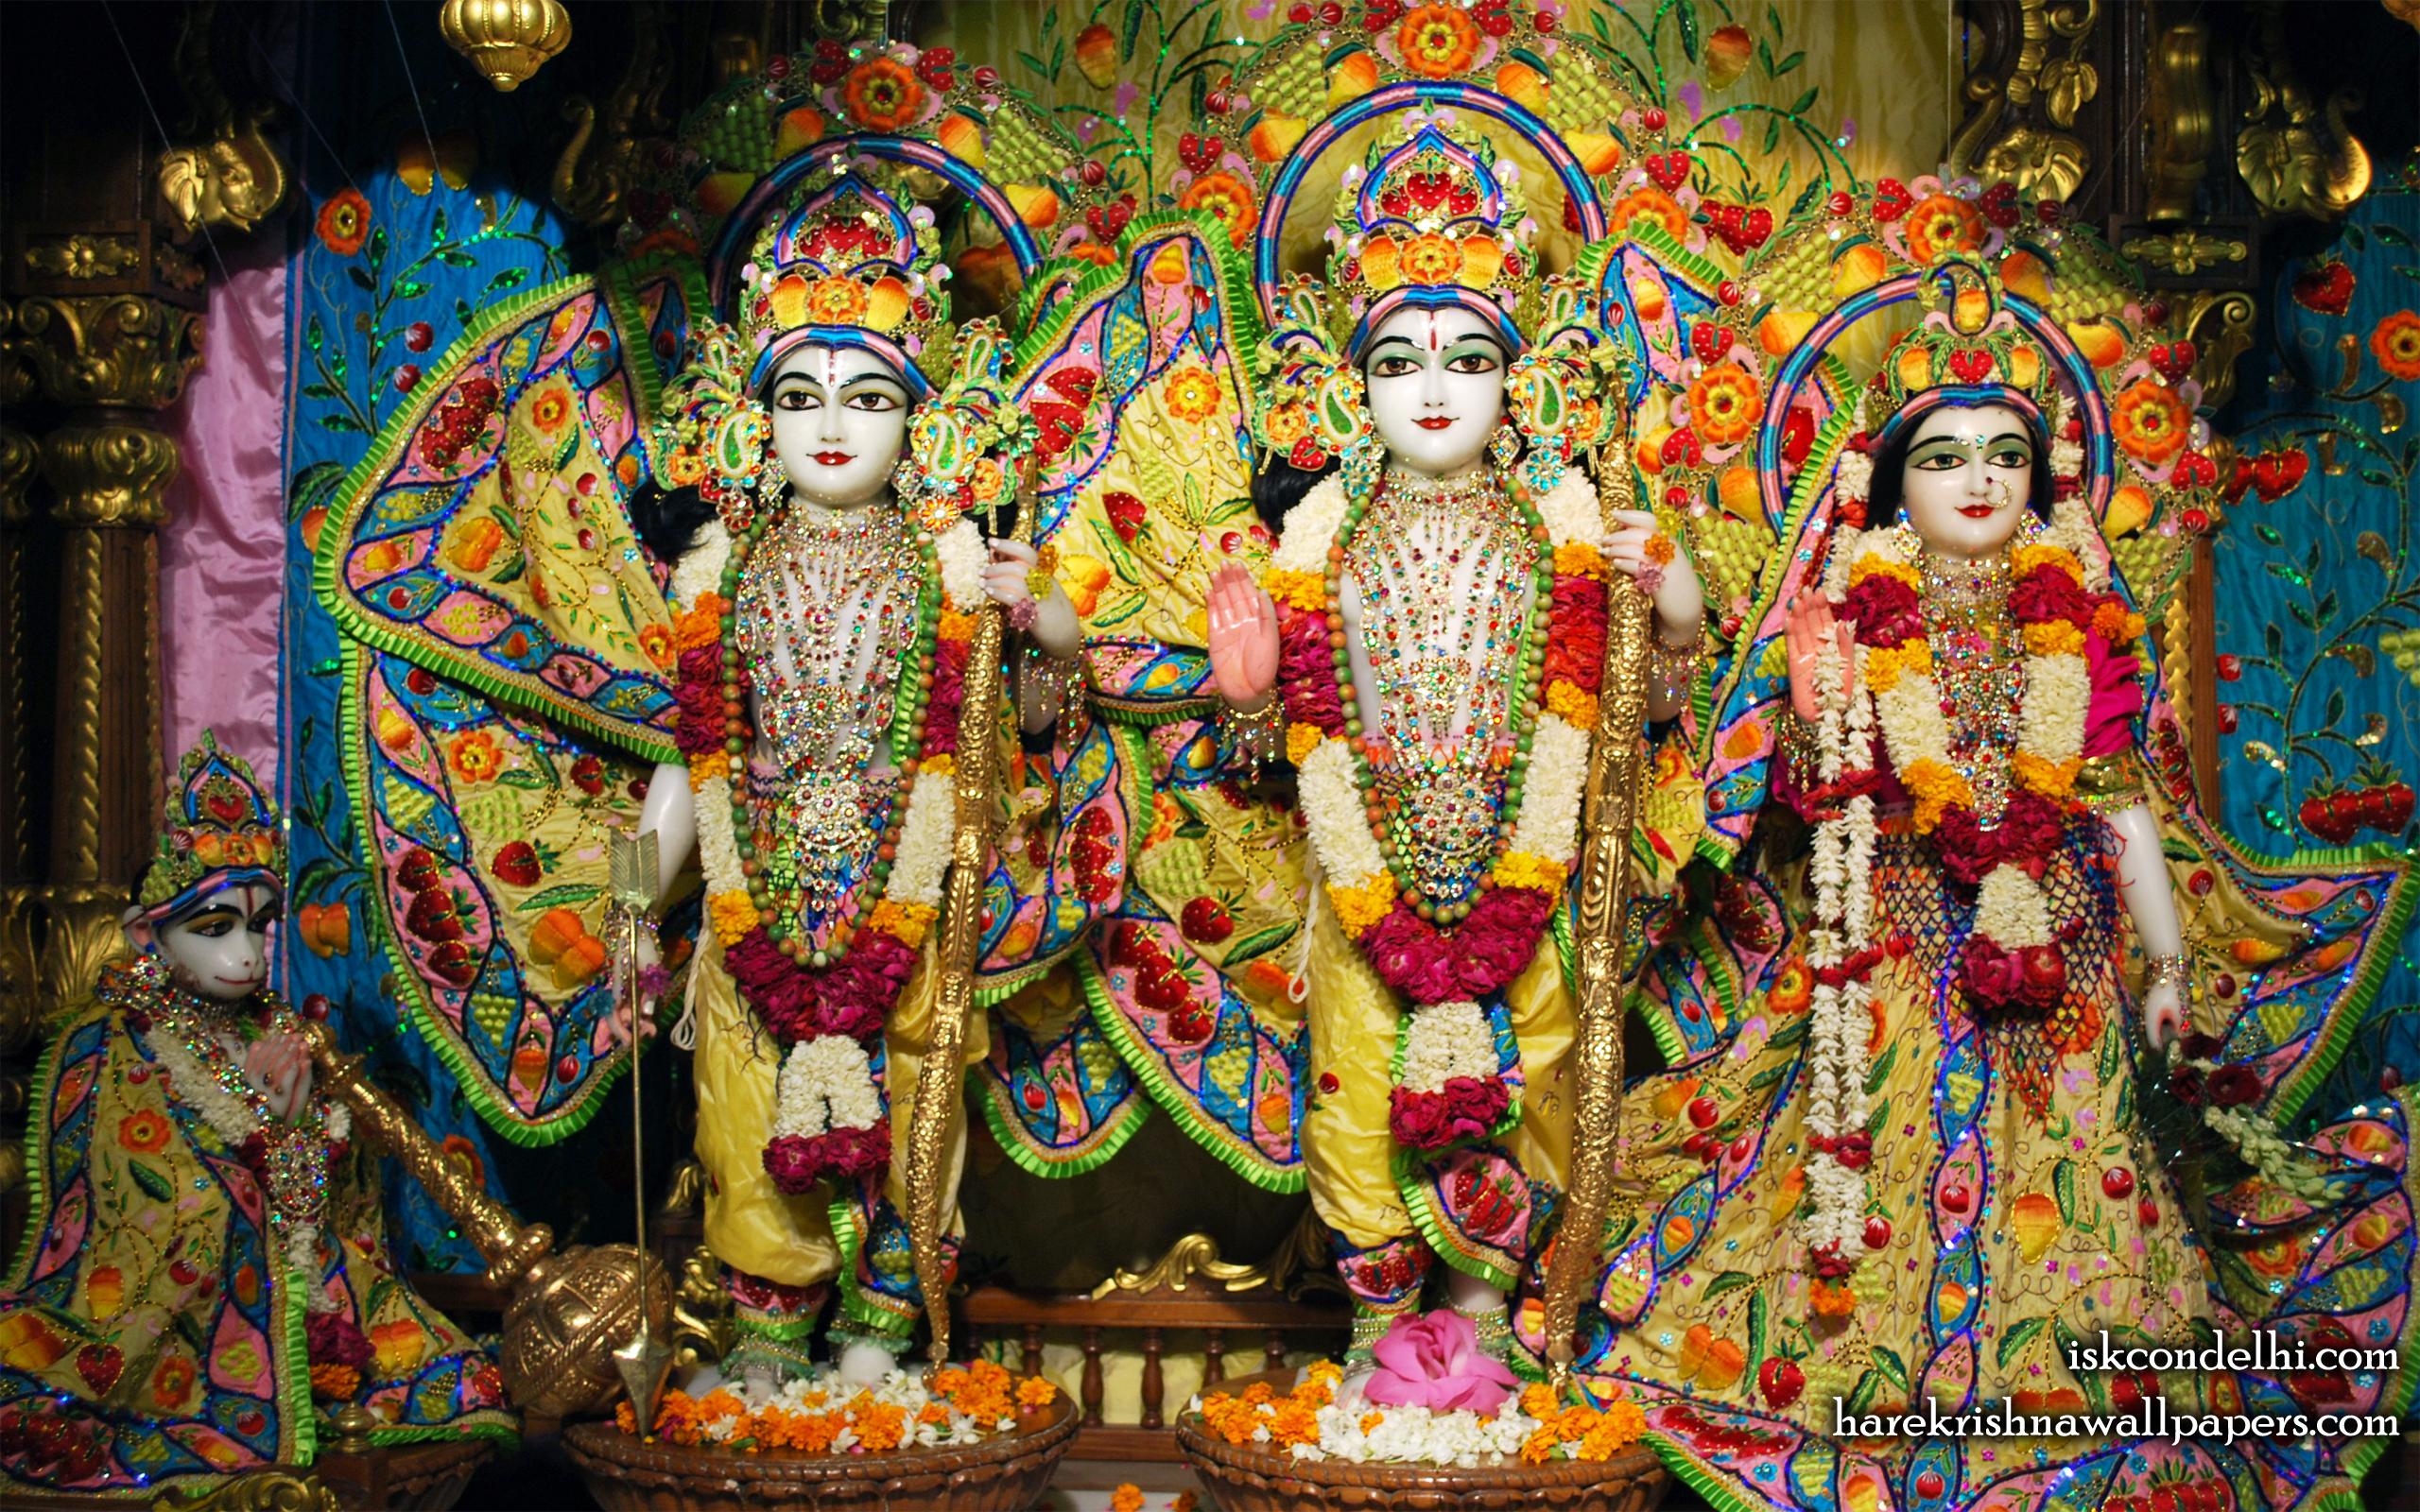 Sri Sri Sita Rama Laxman Hanuman Wallpaper (011) Size 2560x1600 Download